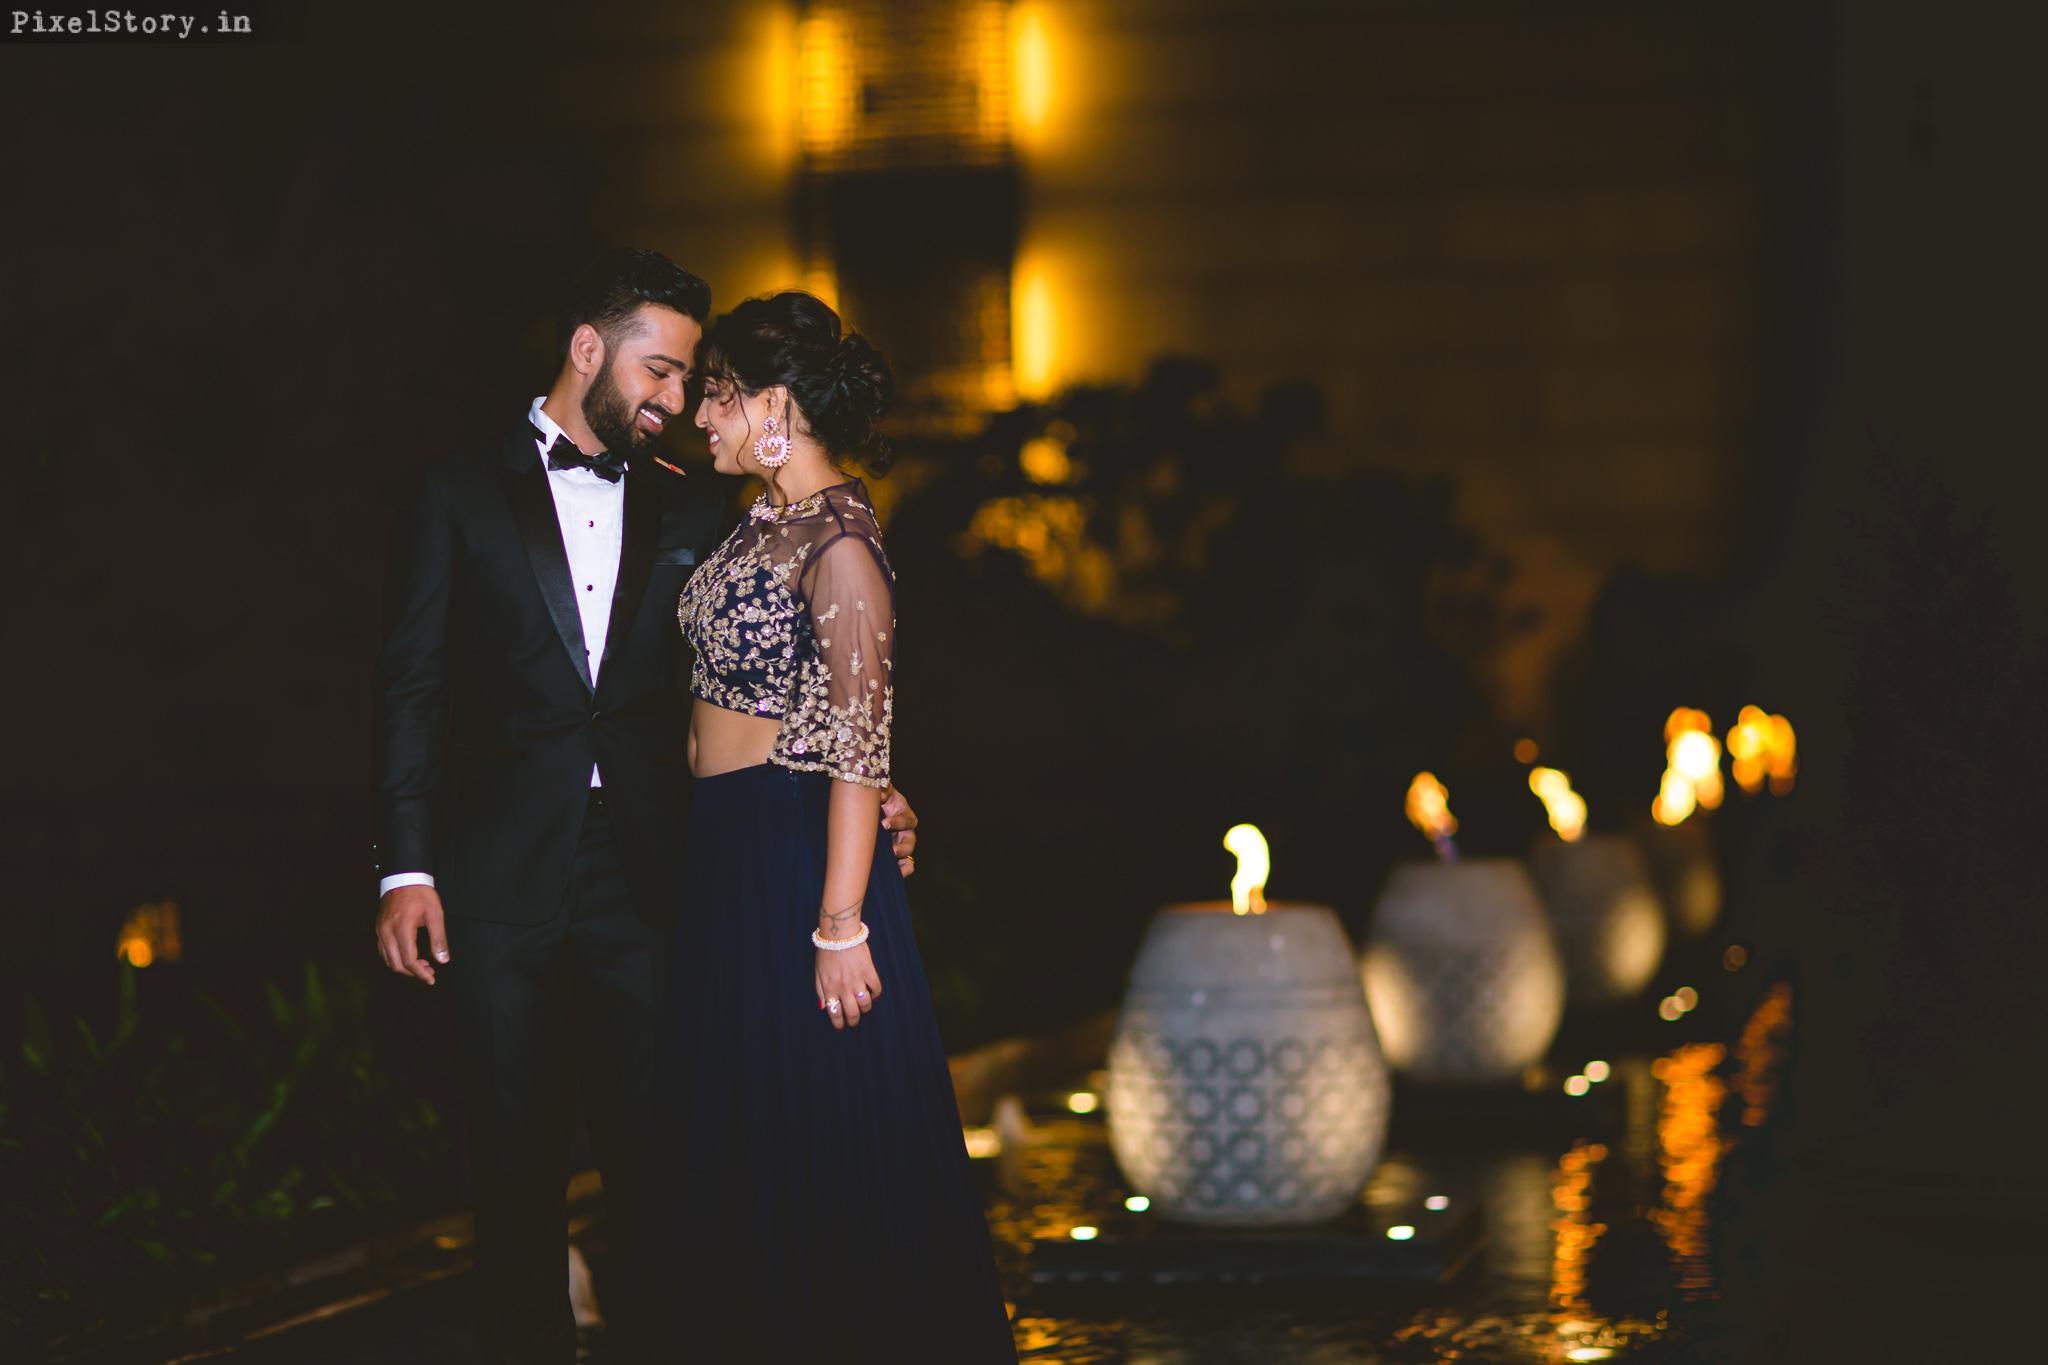 PixelStory-Engagement-Ritz-Carlton-Preksha-Bharath-015.jpg